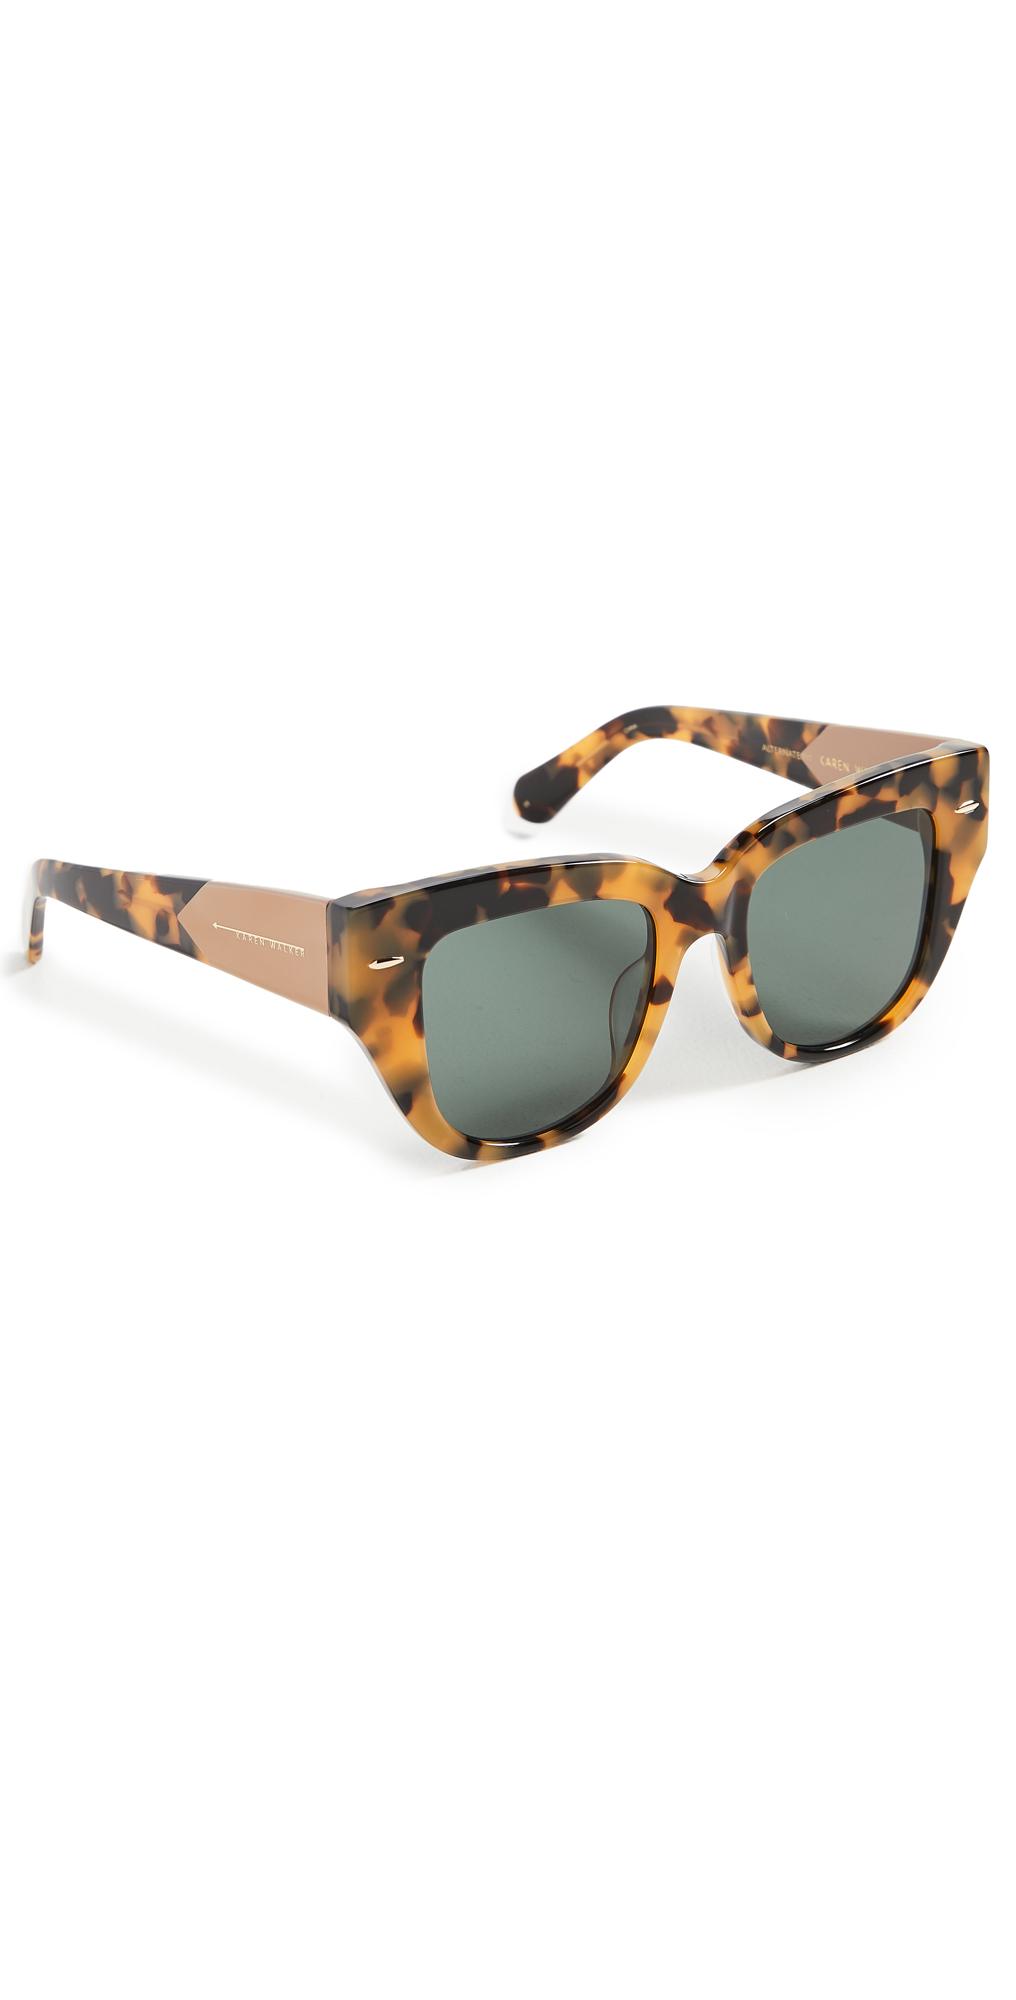 True North Sunglasses